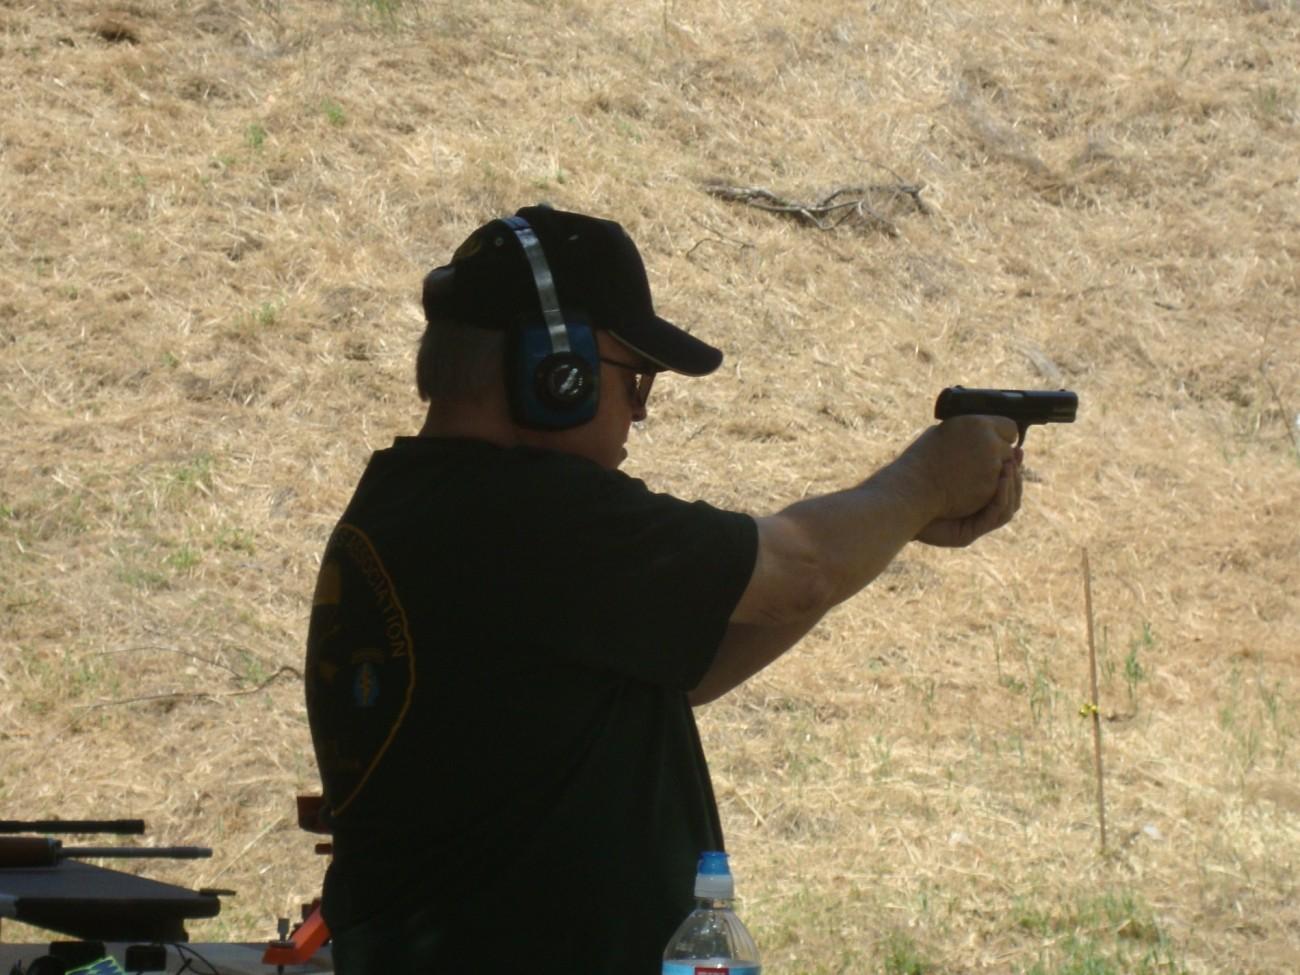 Ed Barrett shooting the Colt Model 1903 Generals pistol